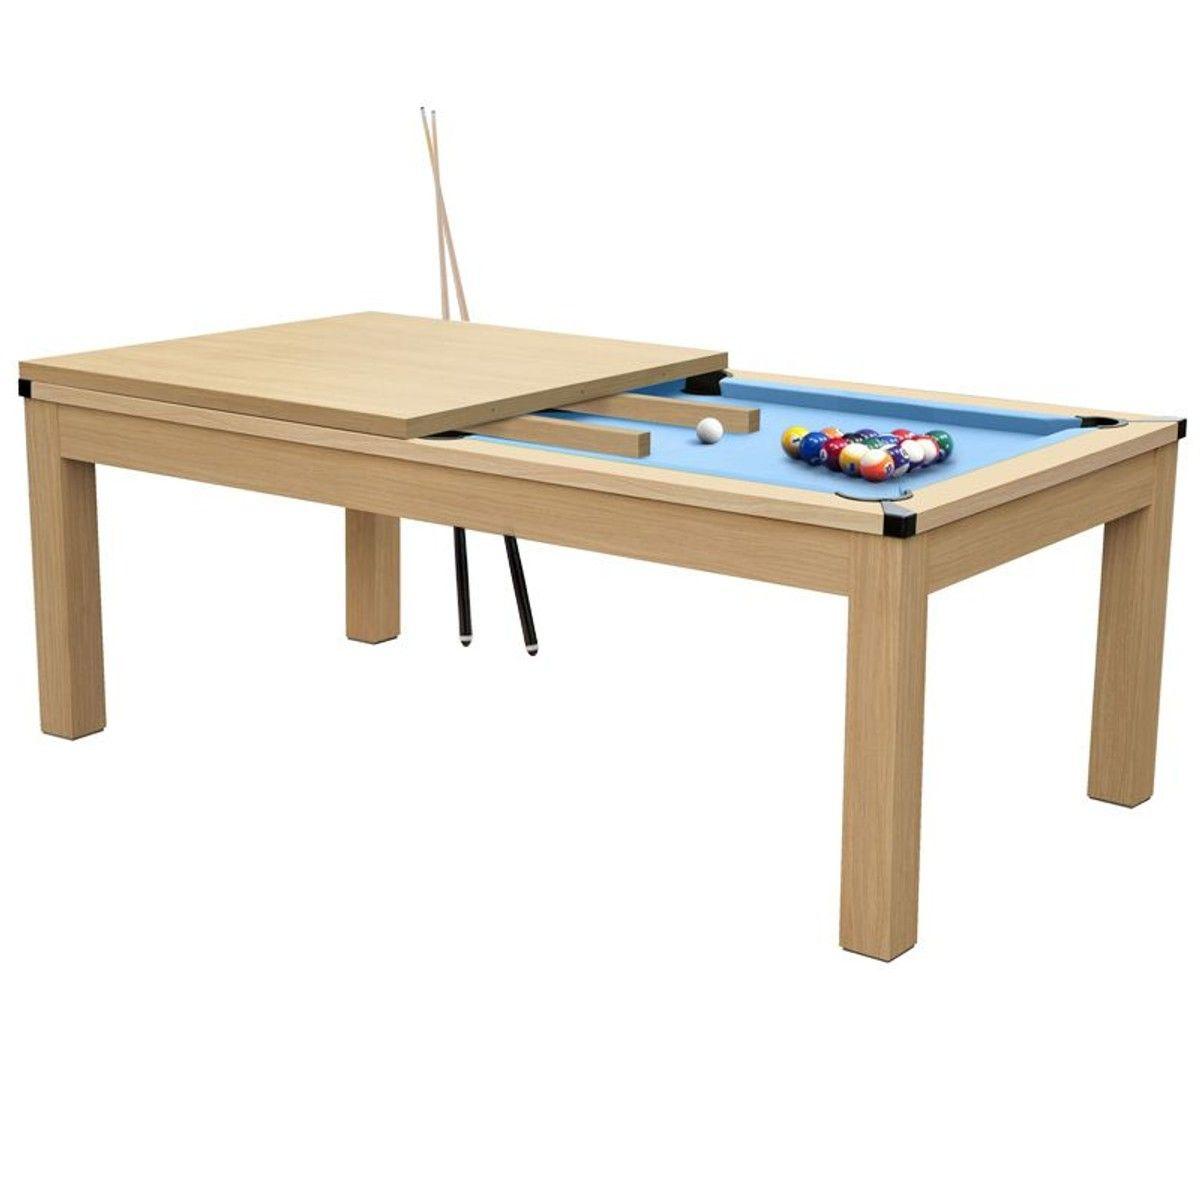 Convertible Tapis De Billard Table Hêtre Bleu Taille8 435RAjLq